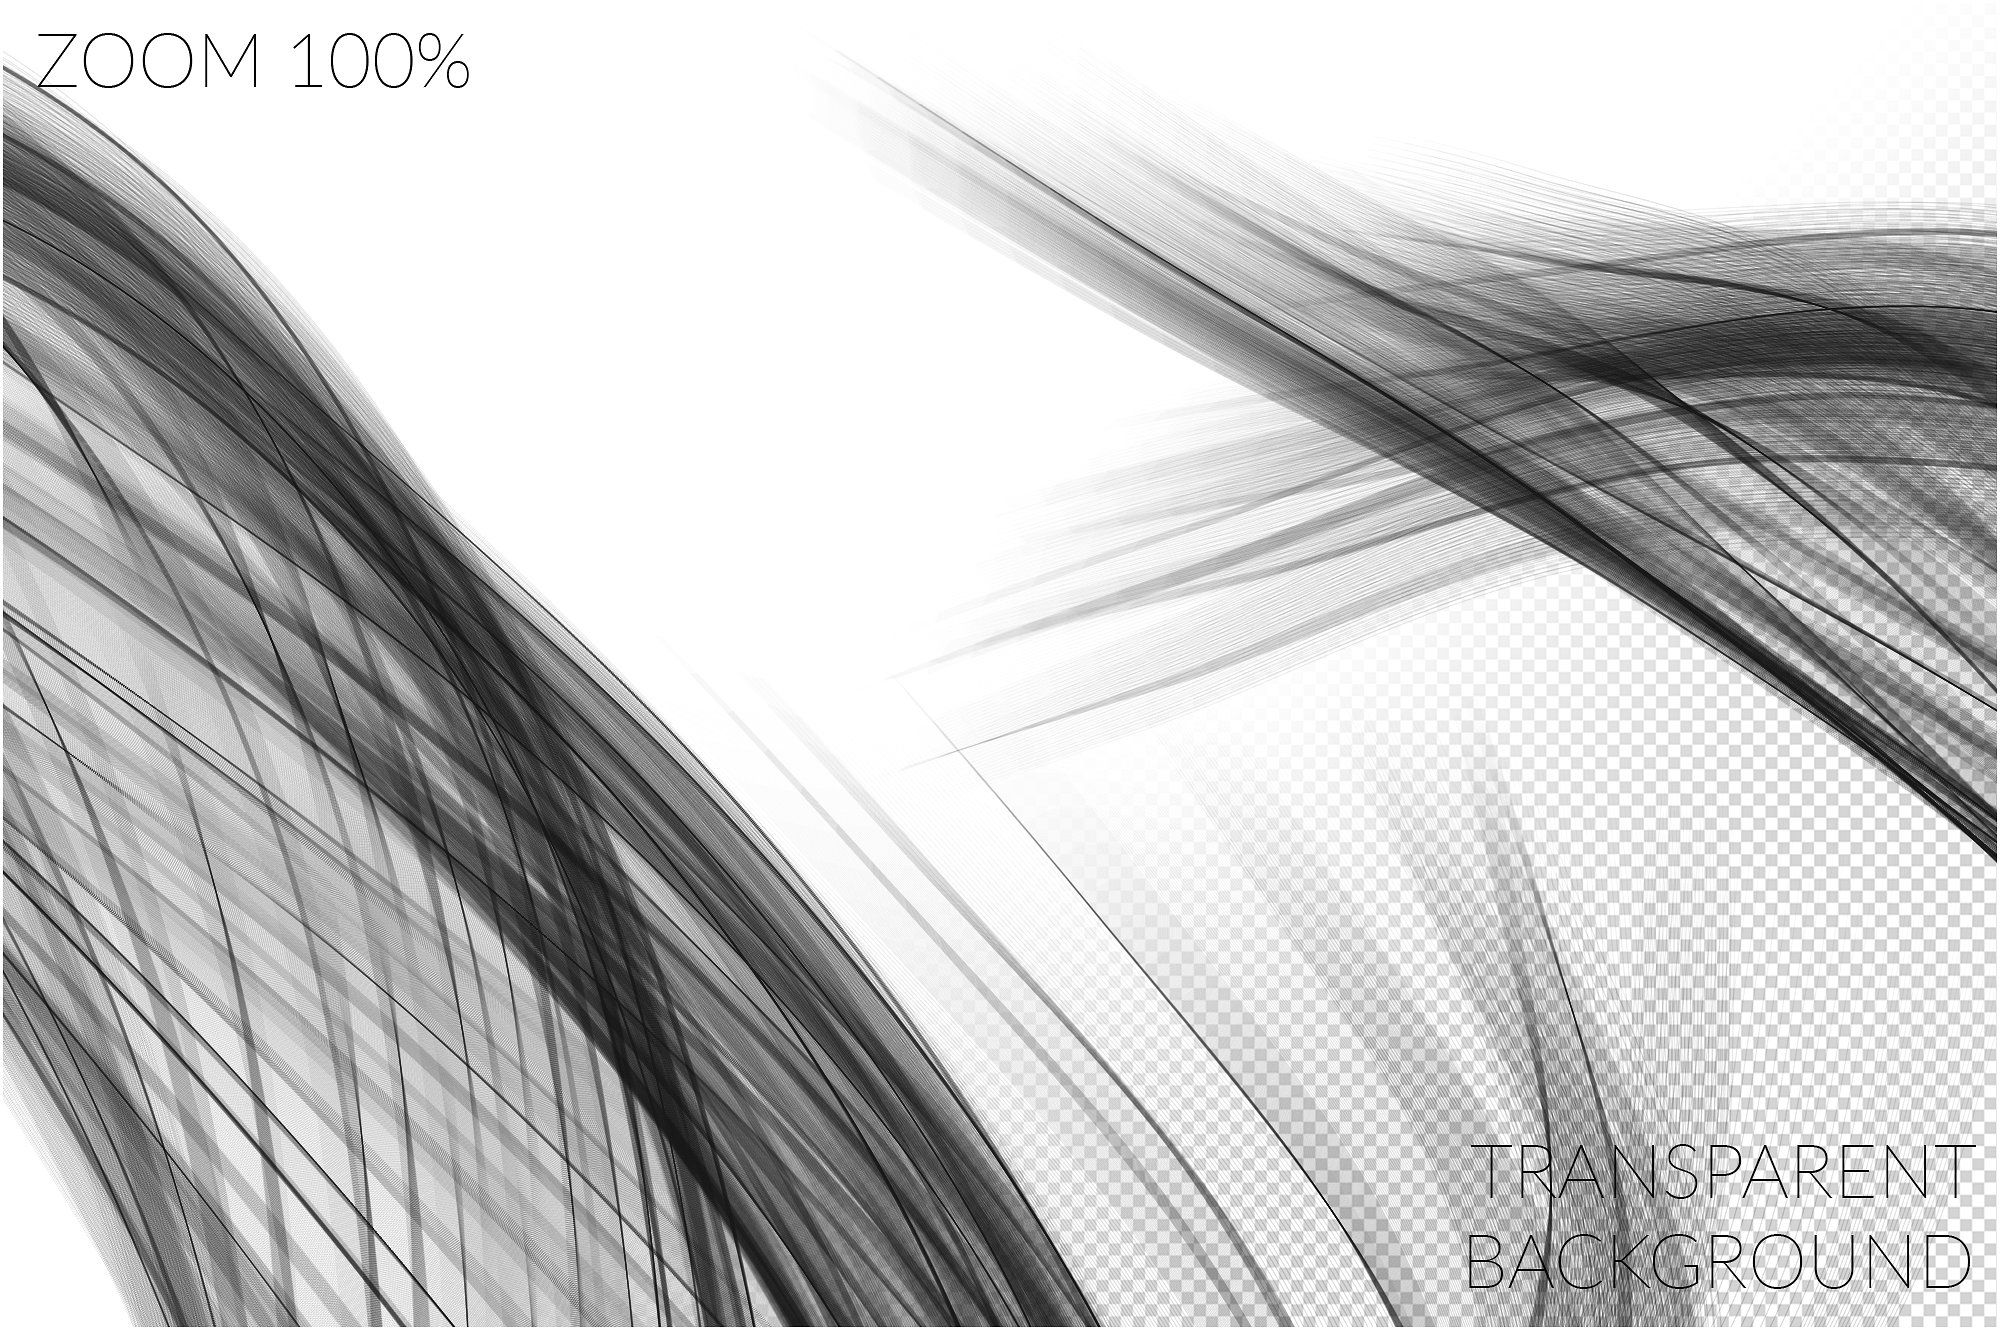 Black Magic Overlays Png Files Format Background Black Magic Transparent Background Overlays